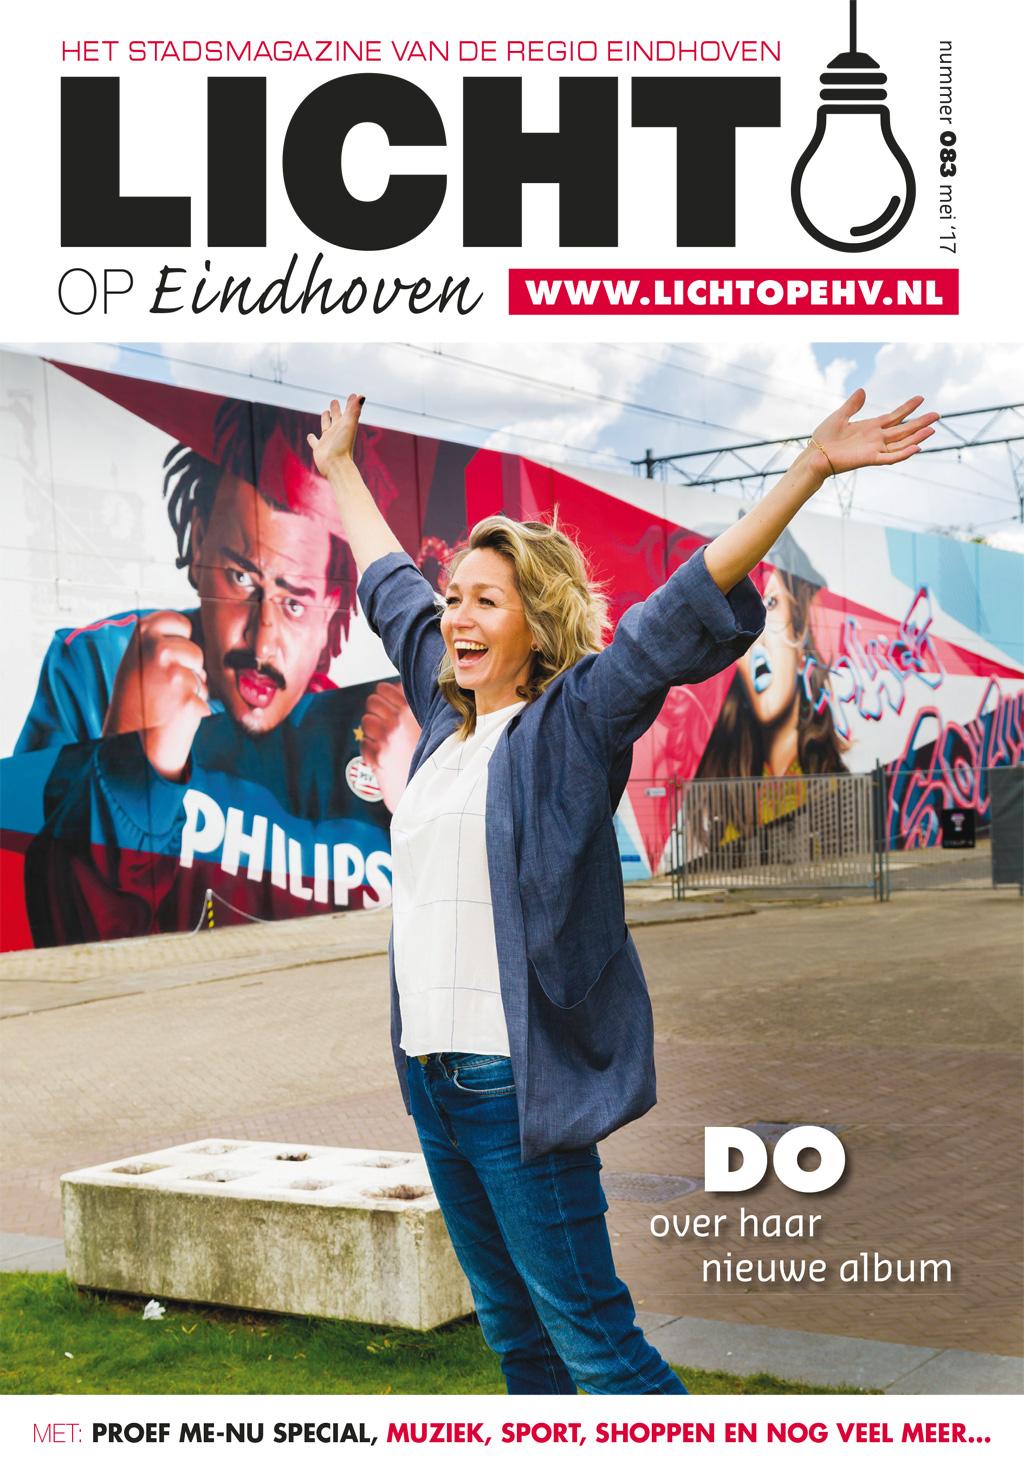 LICHT op Eindhoven - mei.'17 - Cover